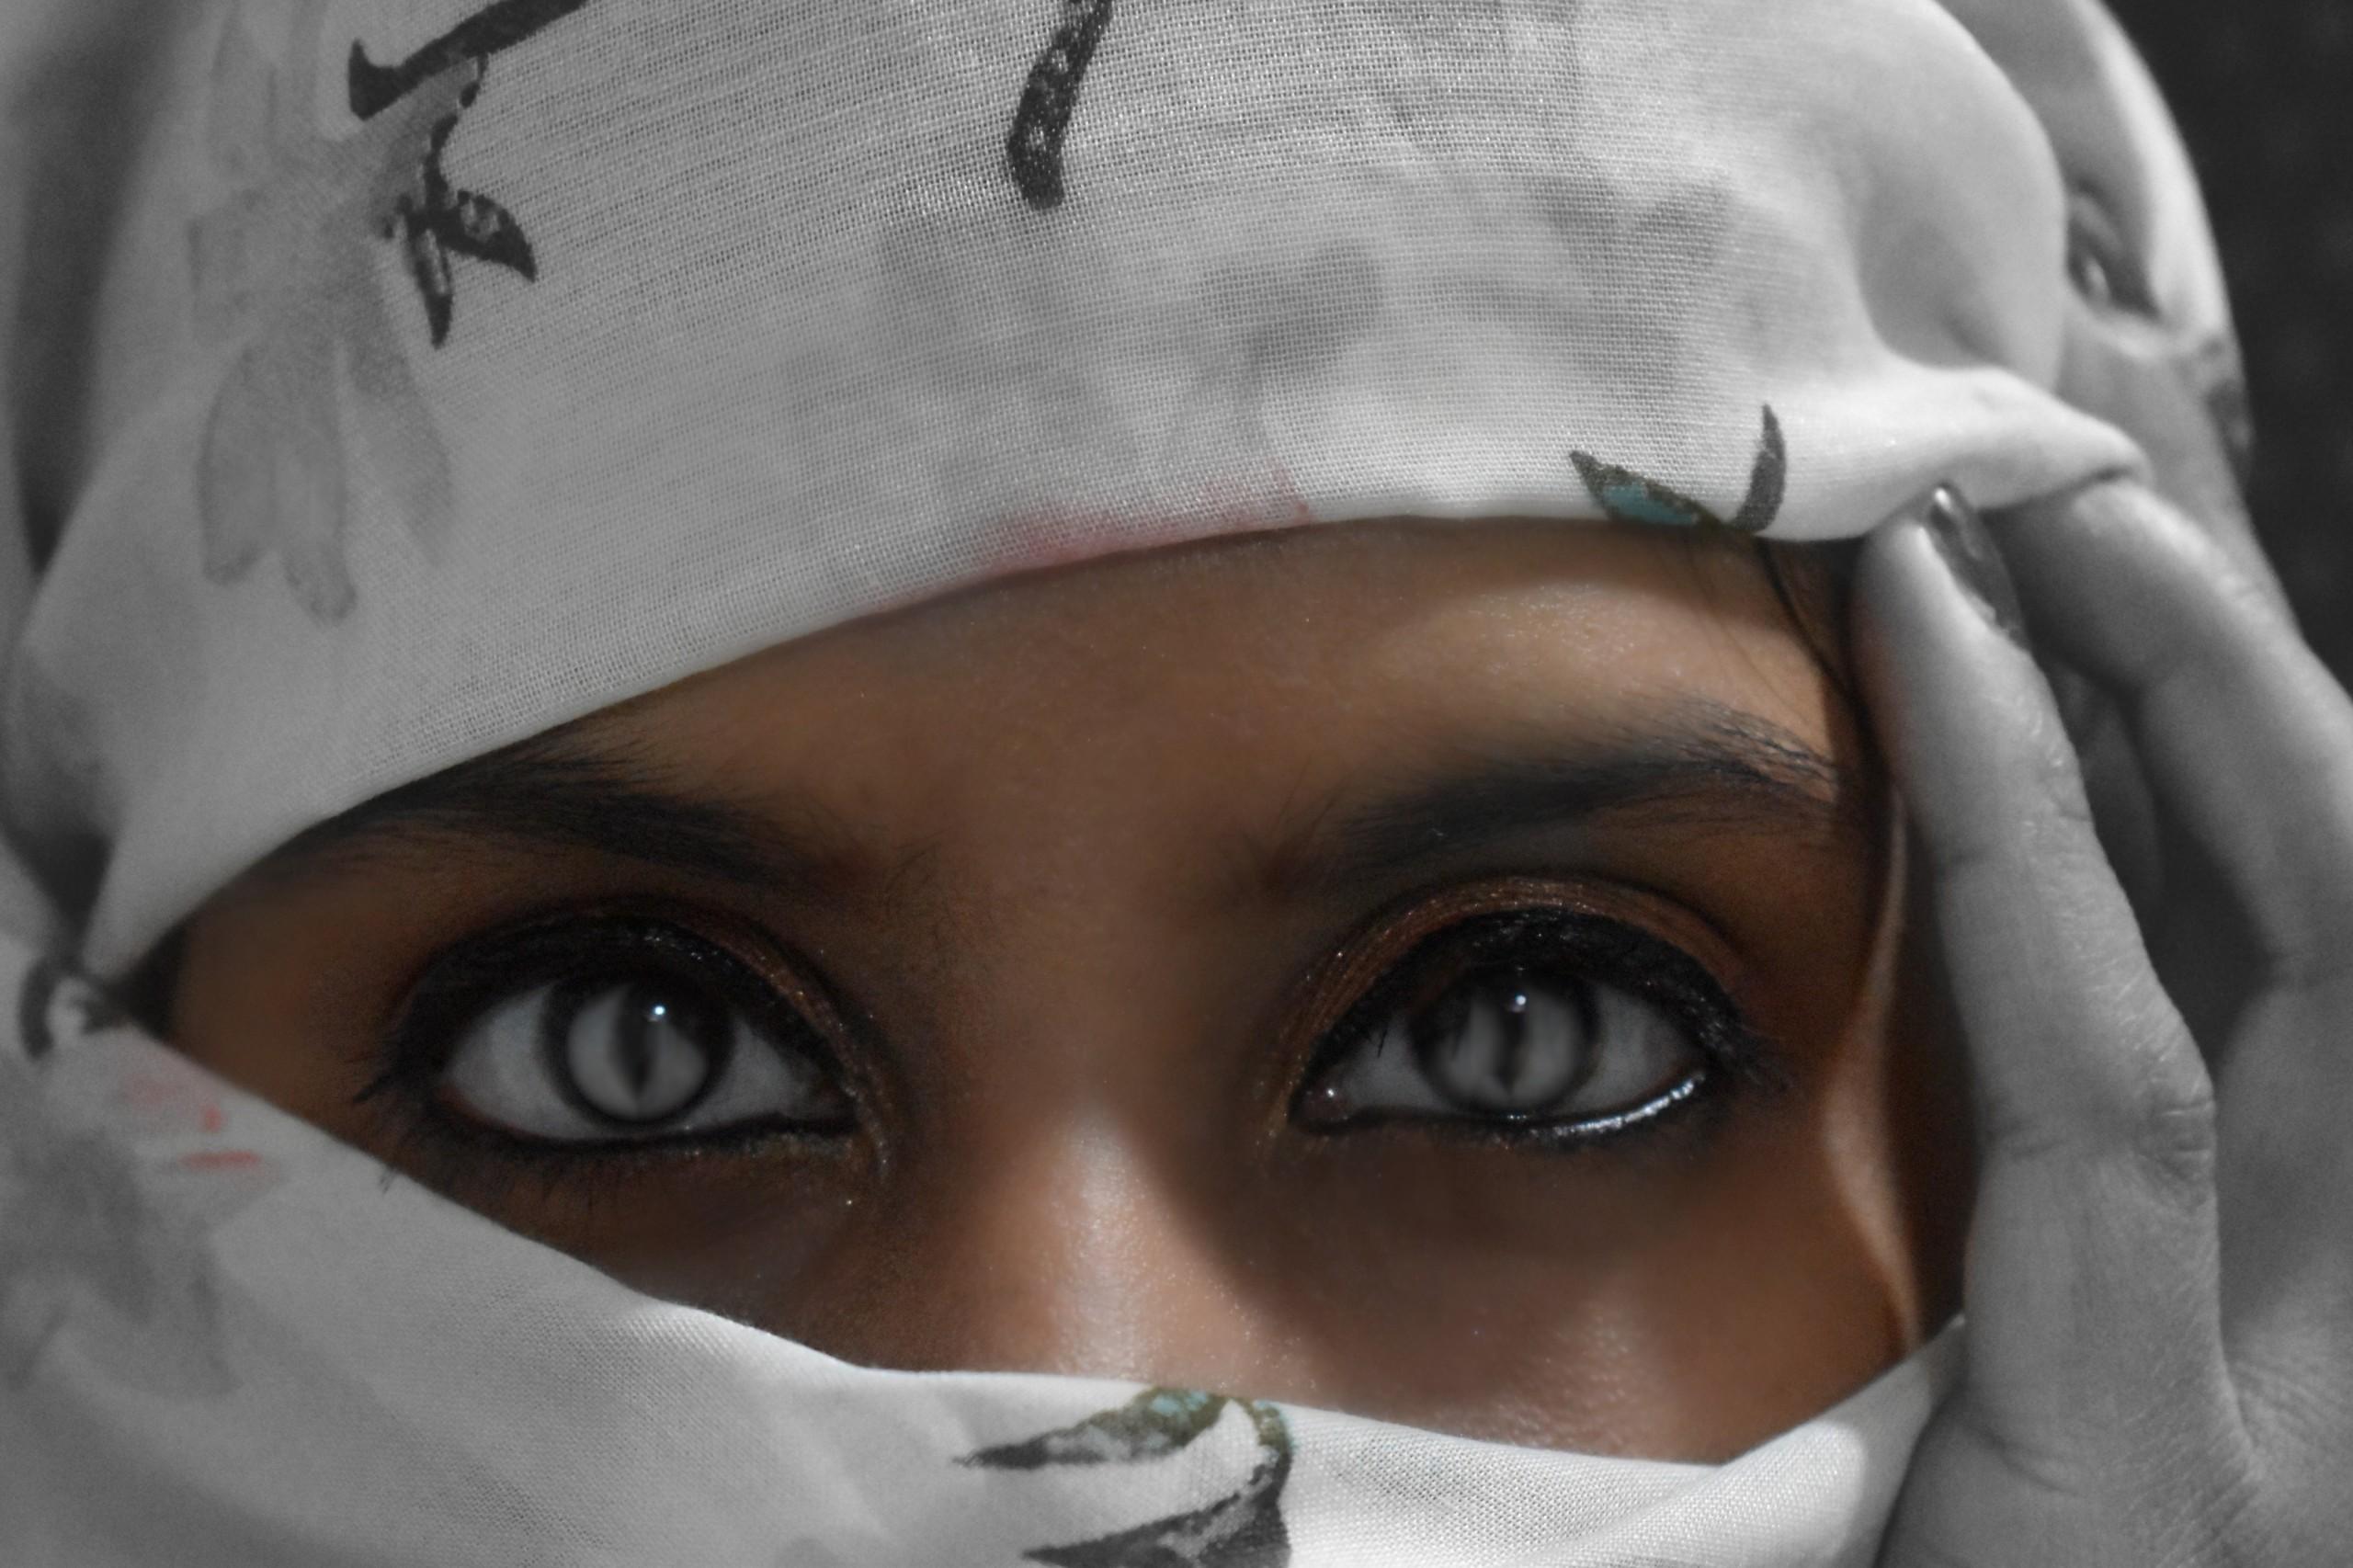 Indian Girl's Eyes